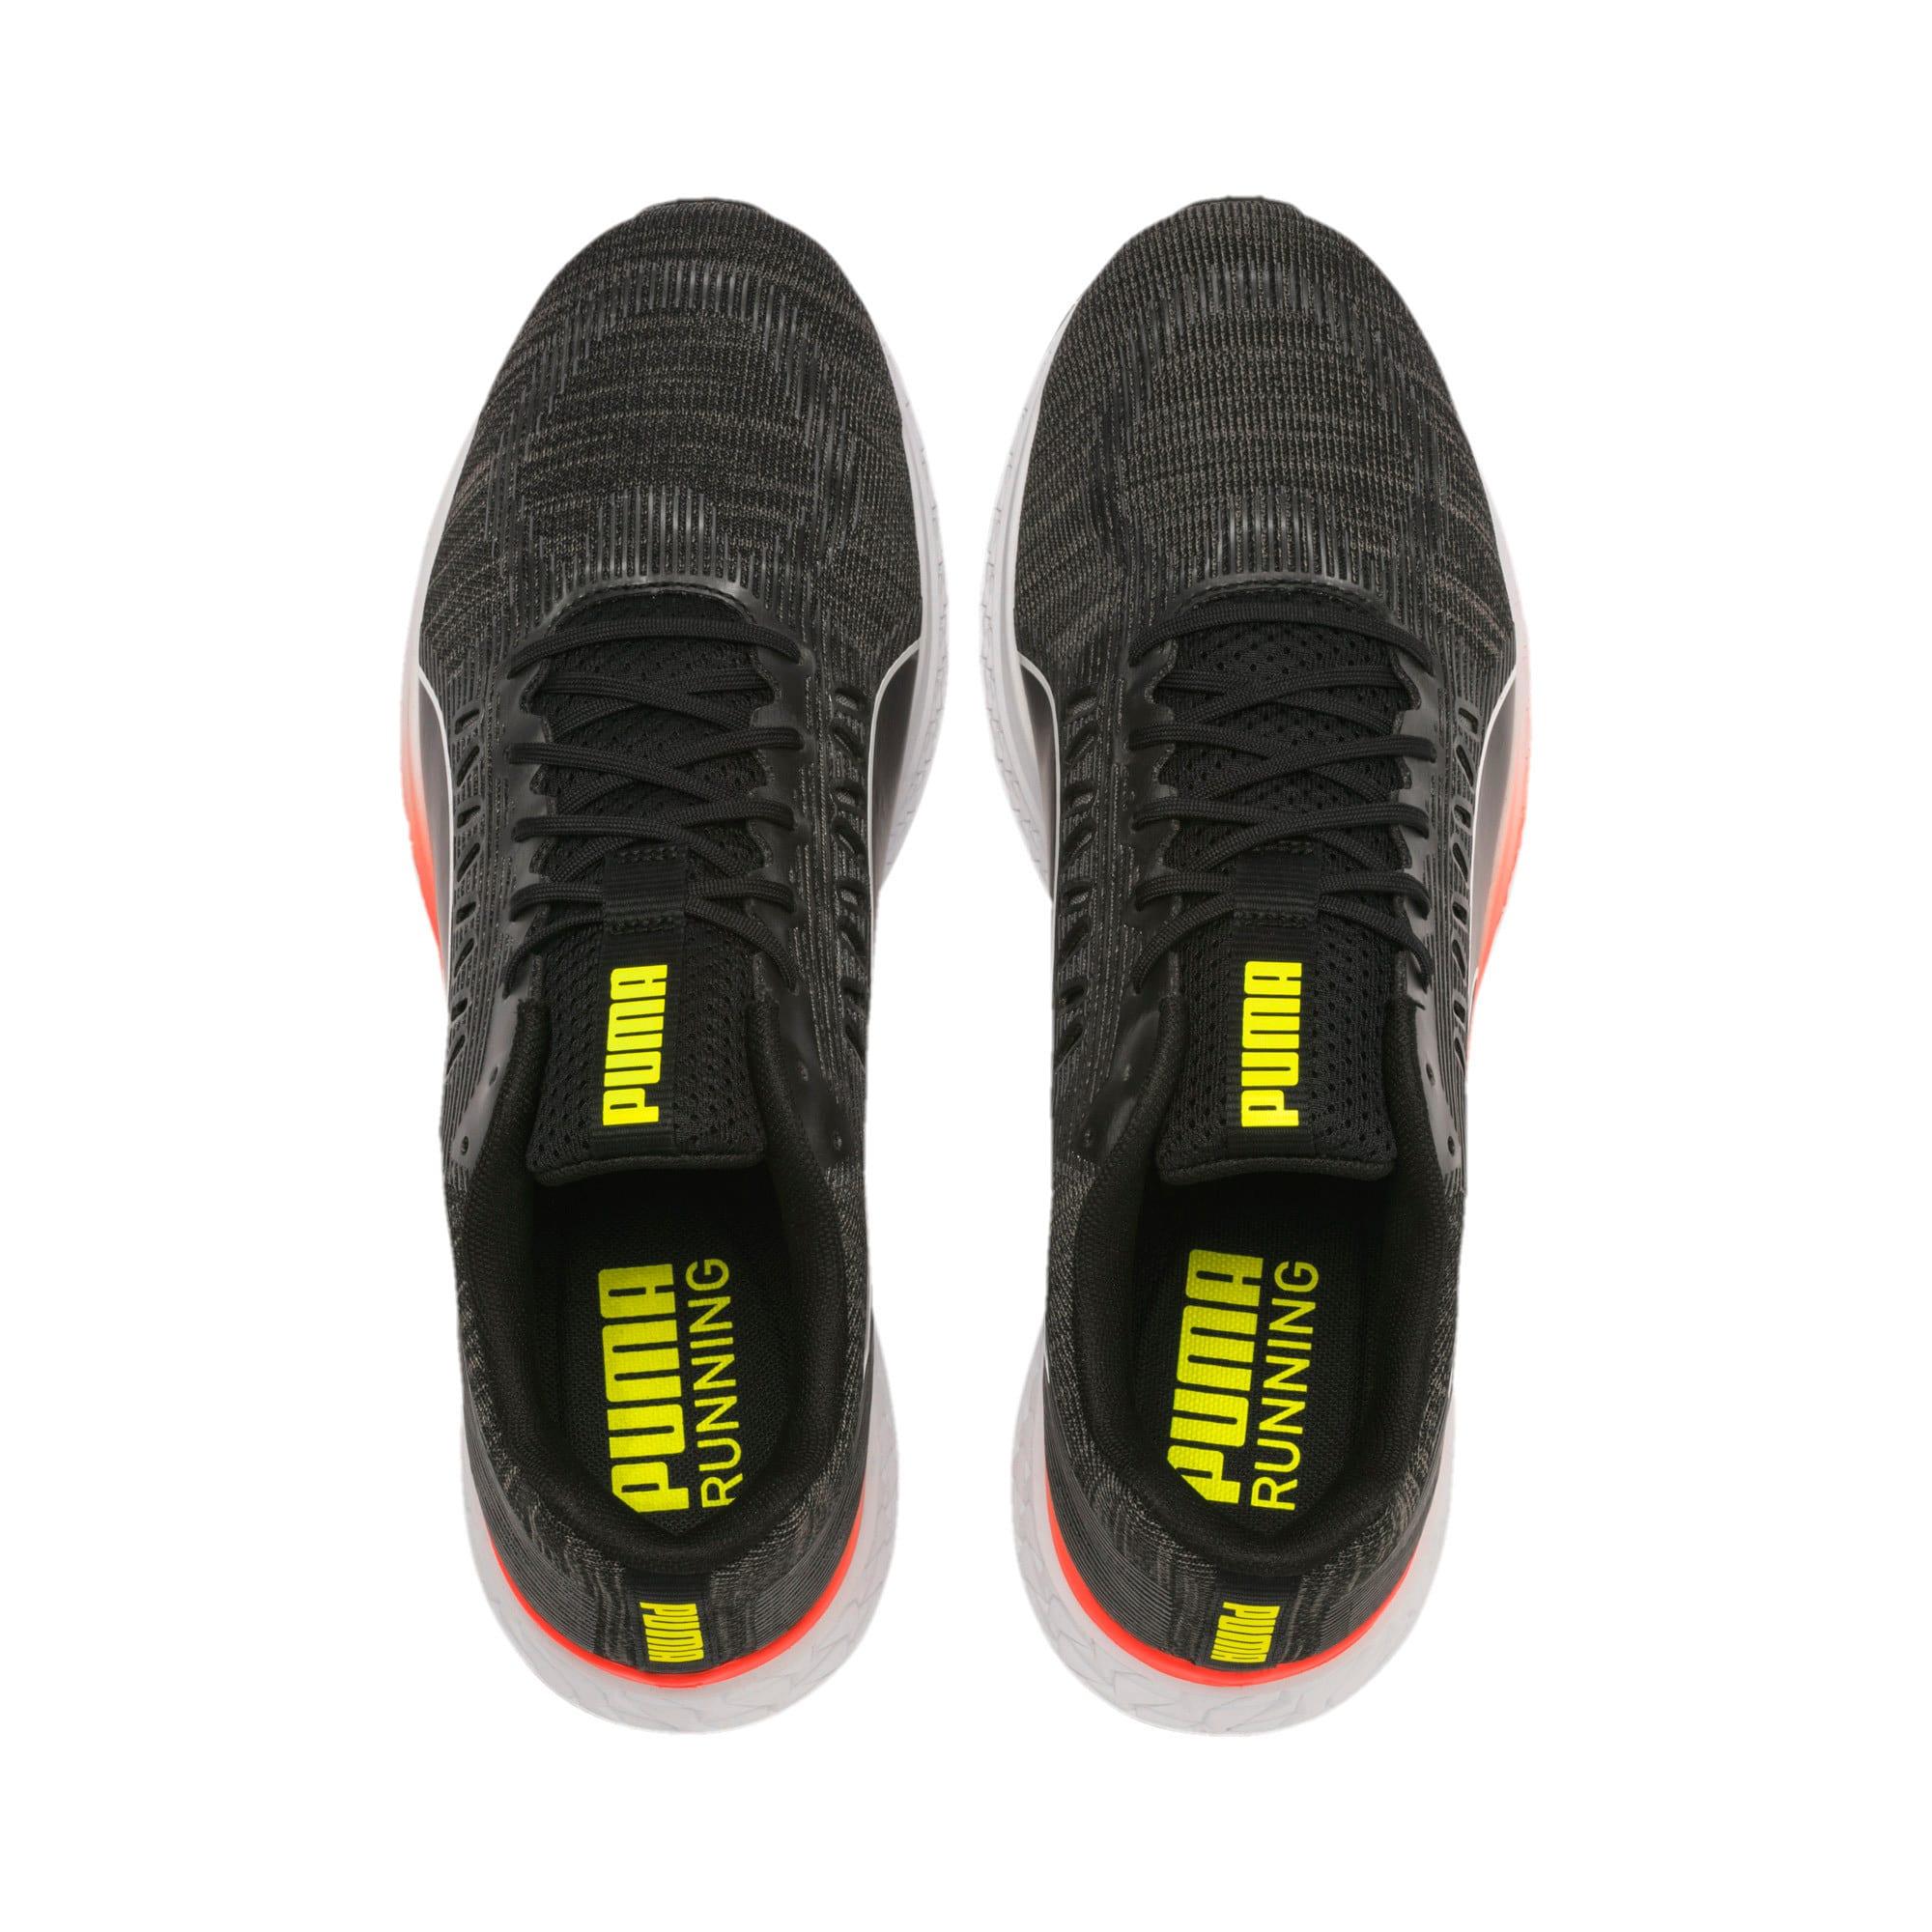 Thumbnail 7 of SPEED Sutamina Running Shoes, Black-CASTLEROCK-Yellow-Red, medium